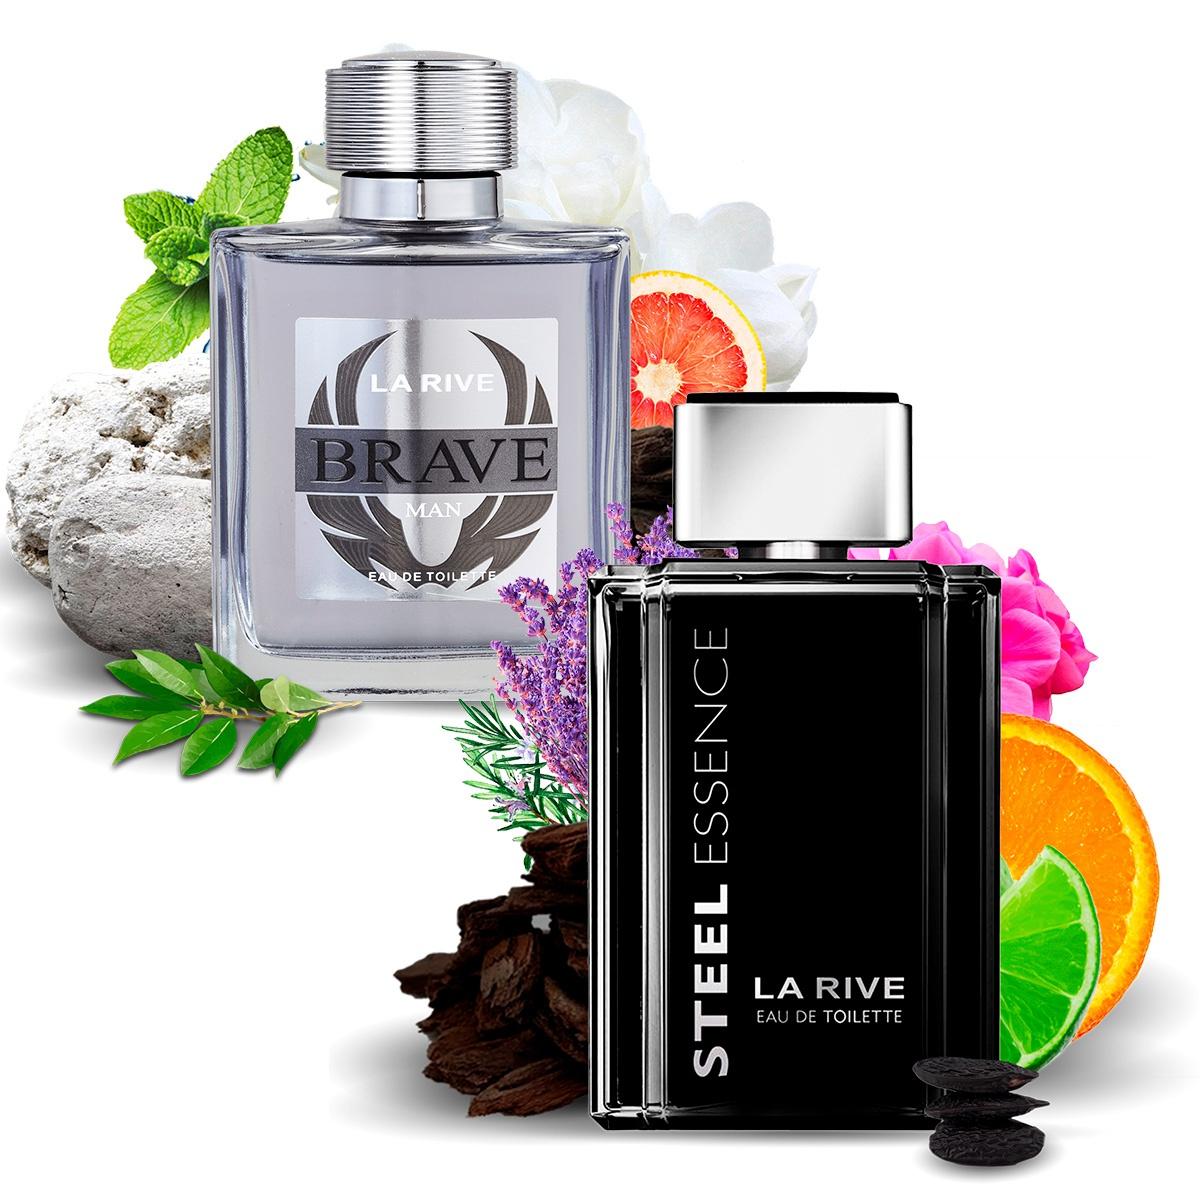 Kit 2 Perfumes Importados Brave e Steel Essence La Rive